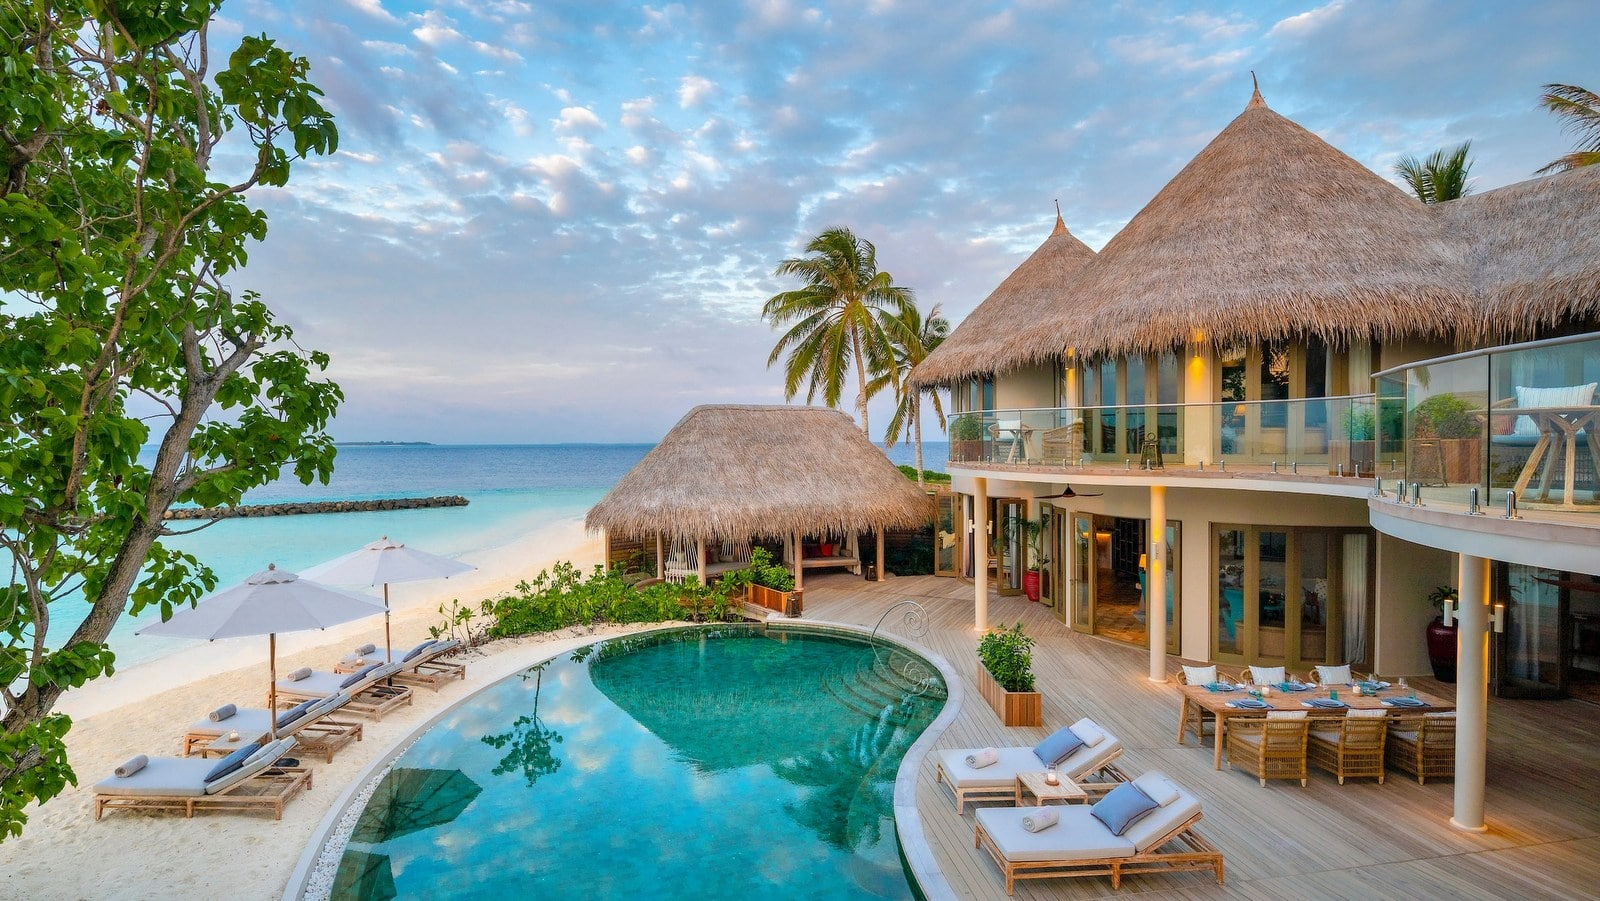 Мальдивы, отель The Nautilus Maldives, номер Three-Bedroom The Nautilus Mansion